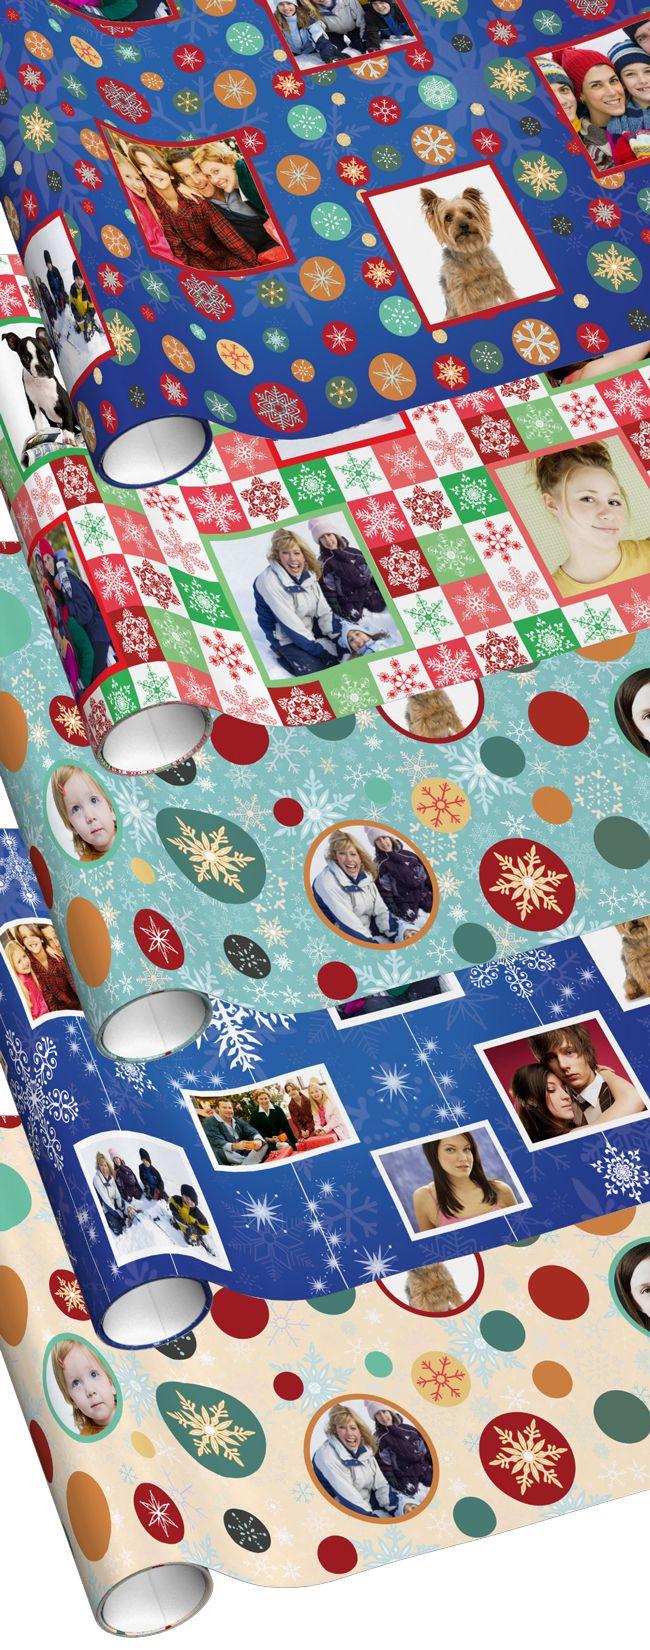 Family Photo Christmas / Holiday Season Wrapping Paper